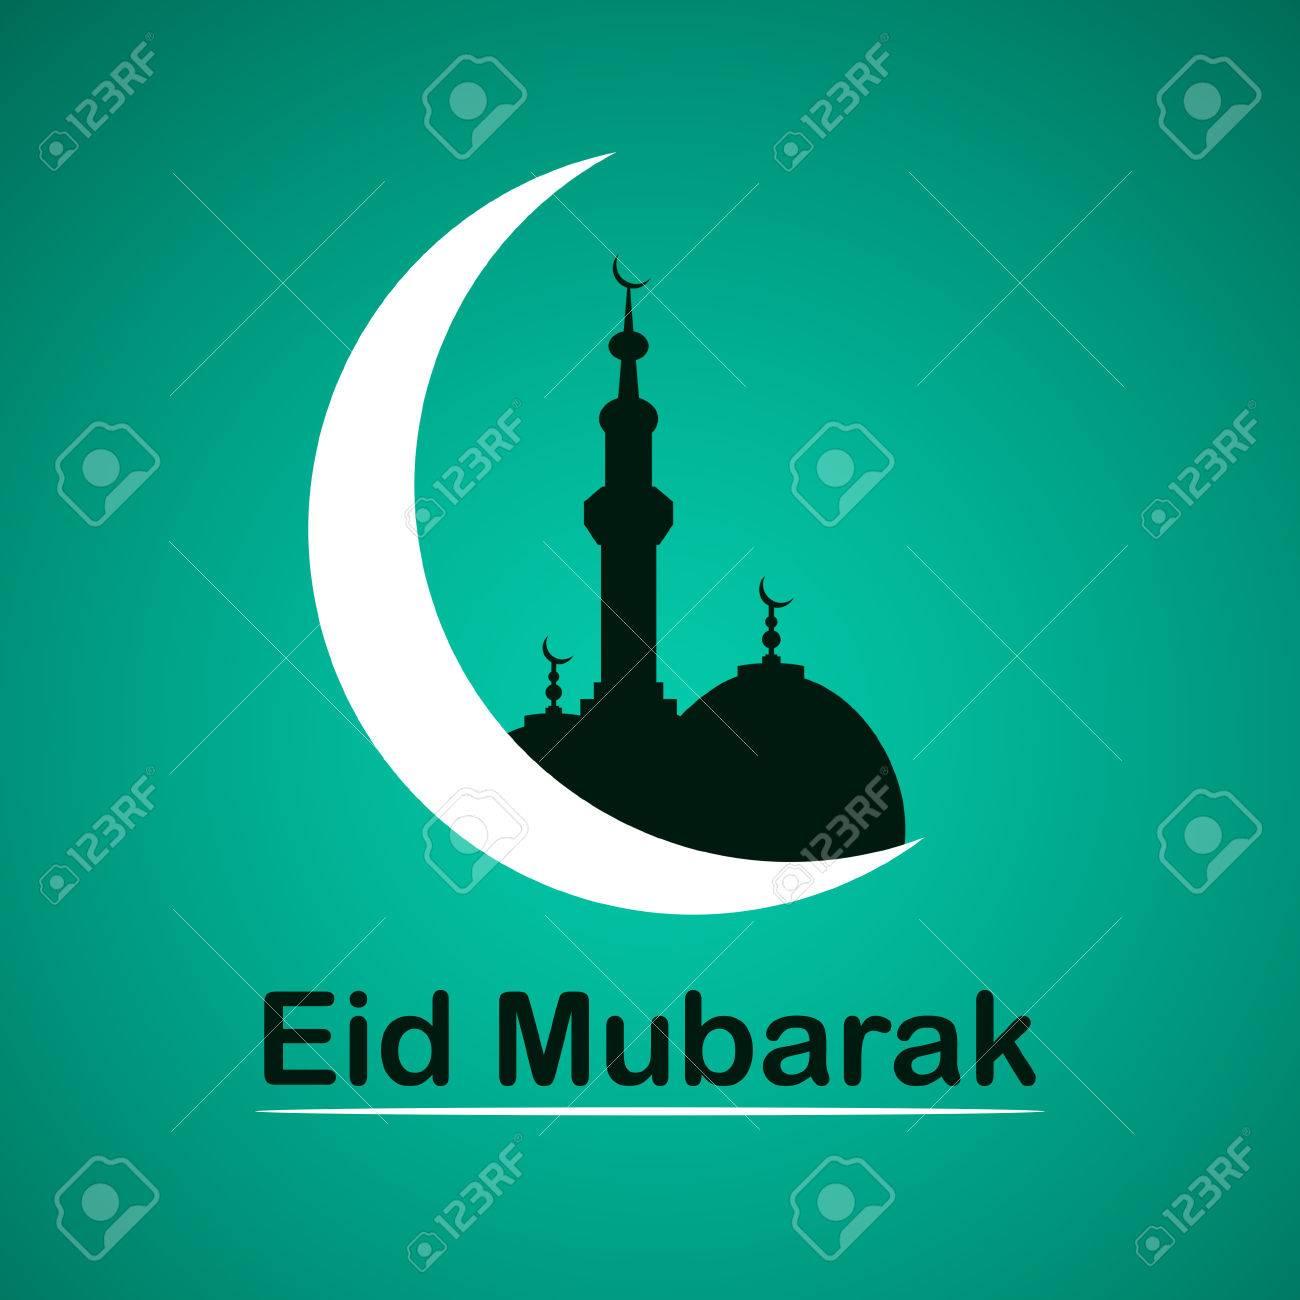 Eid Mubarak Wallpaper Eid Ul Adha Eid Ul Fitr